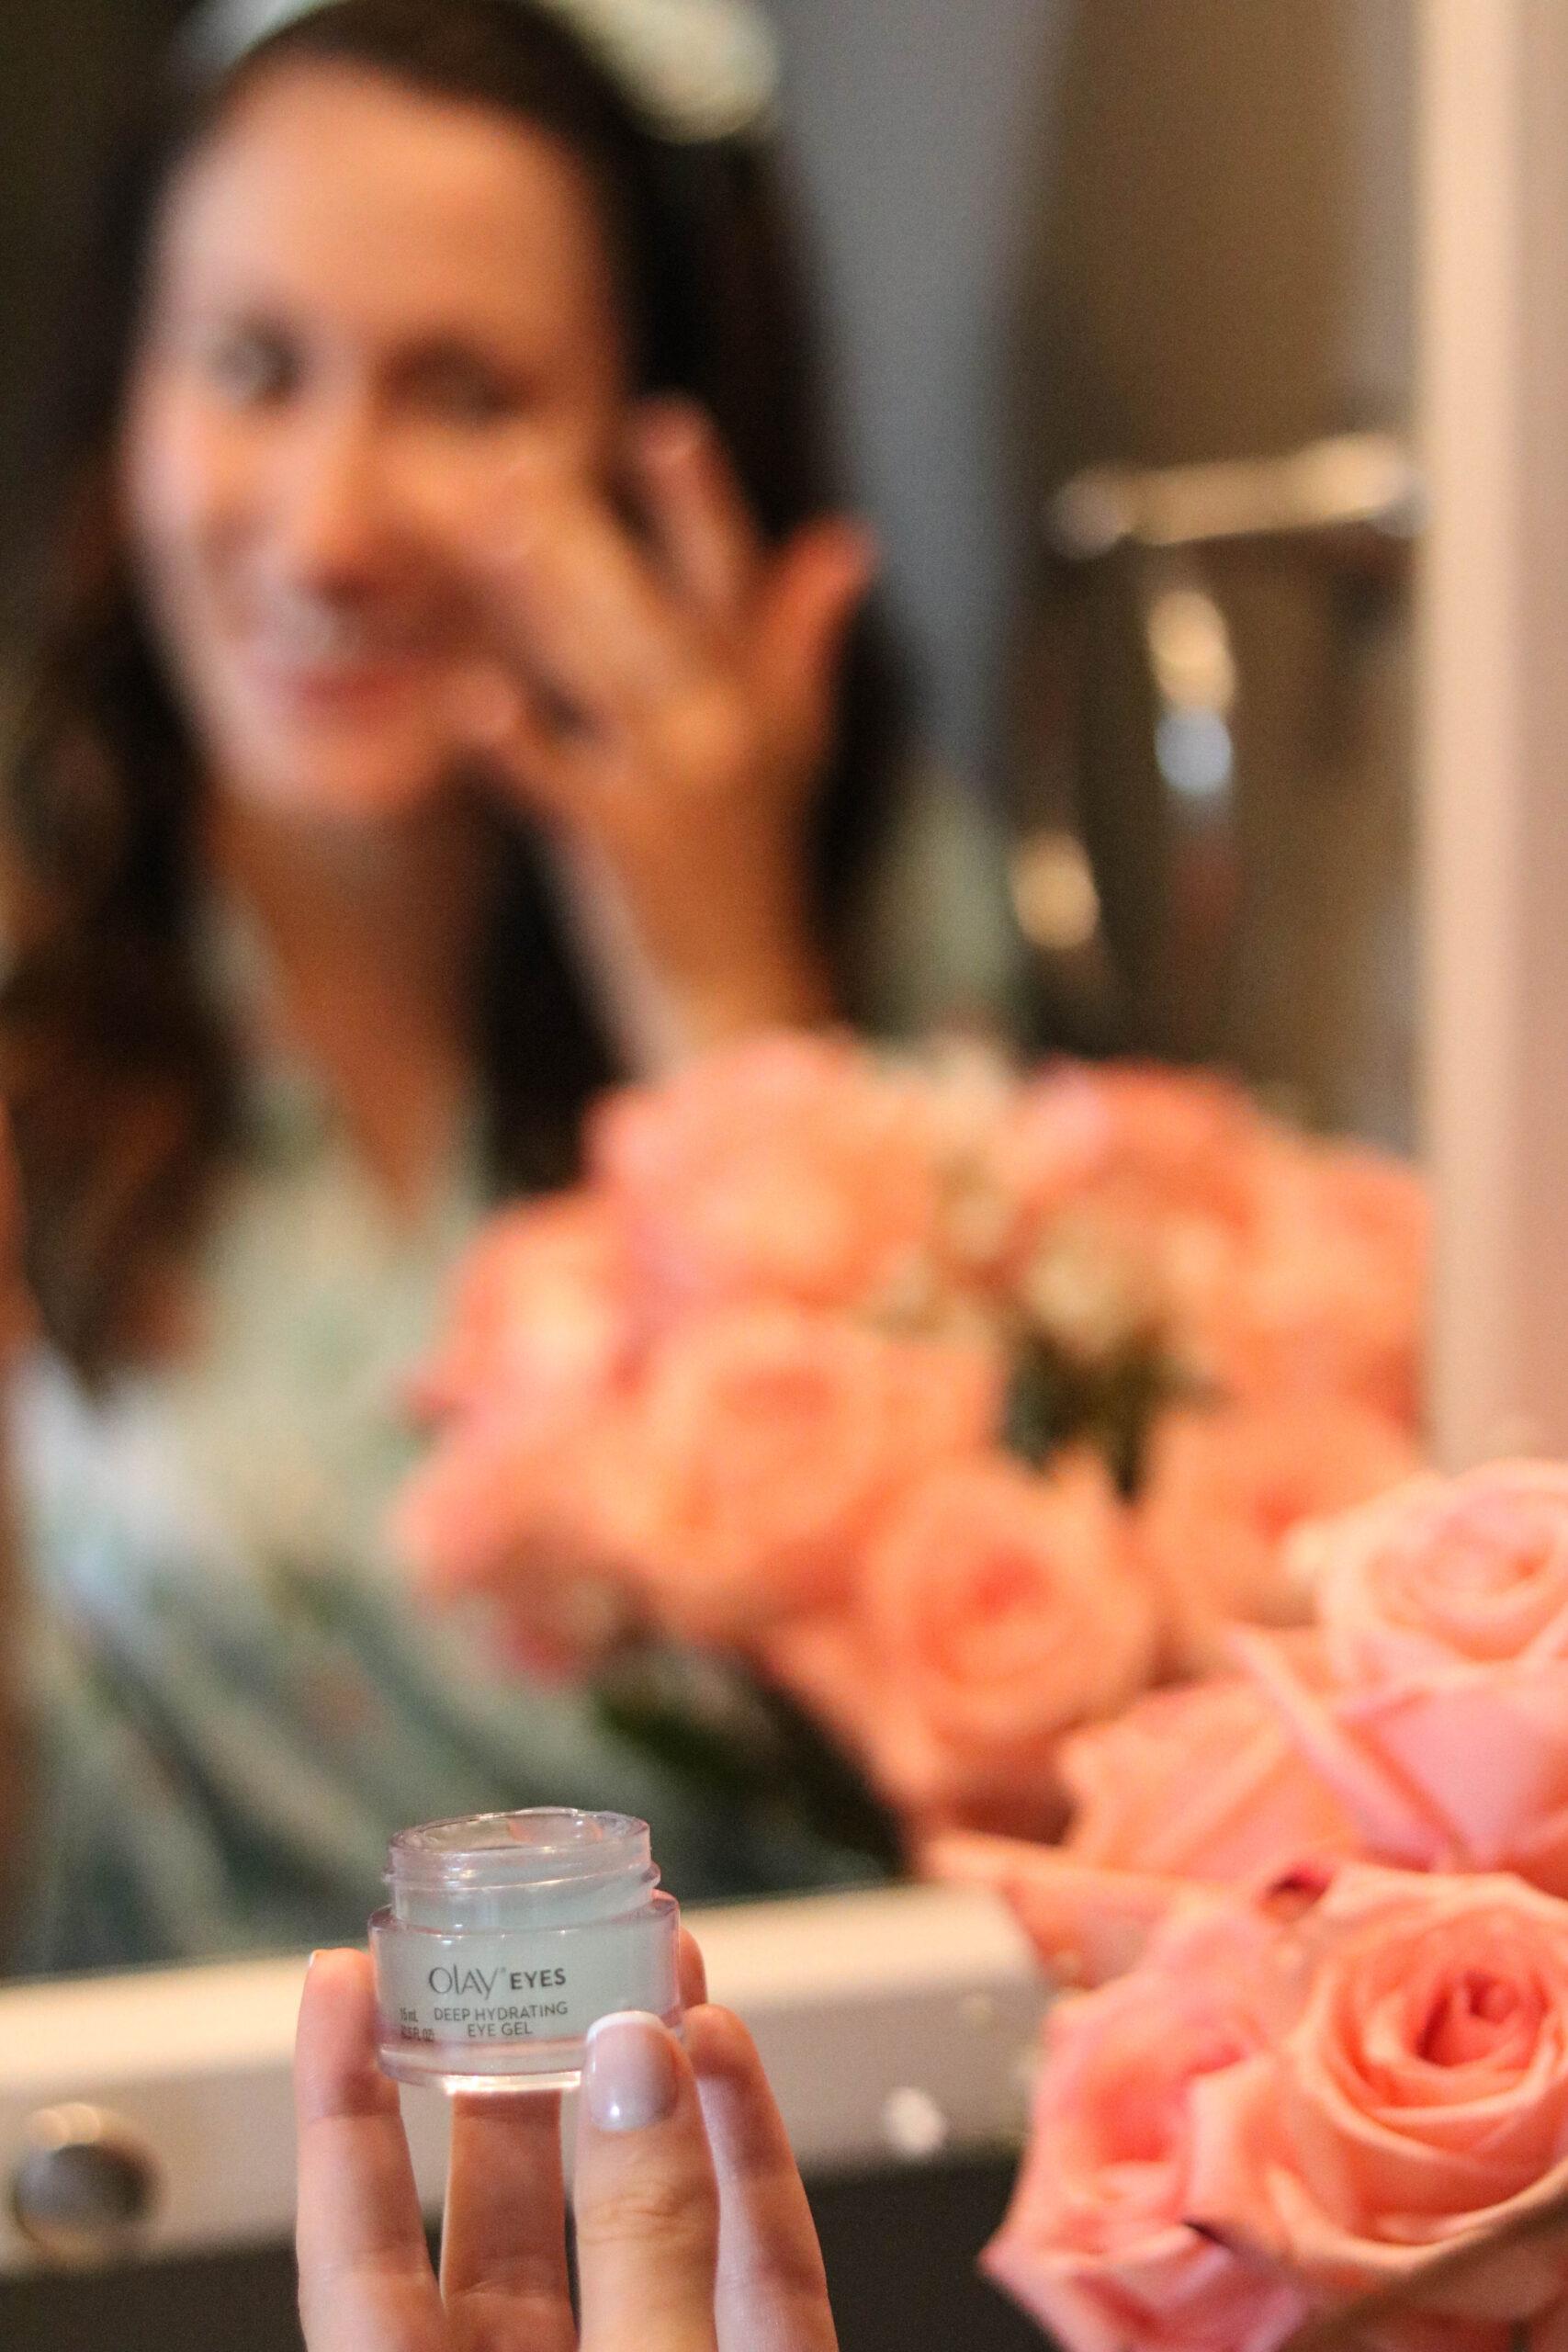 Glow, Baby, Glow! – 28 Day Effects of my Glow-Ready Pregnancy Skincare Routines